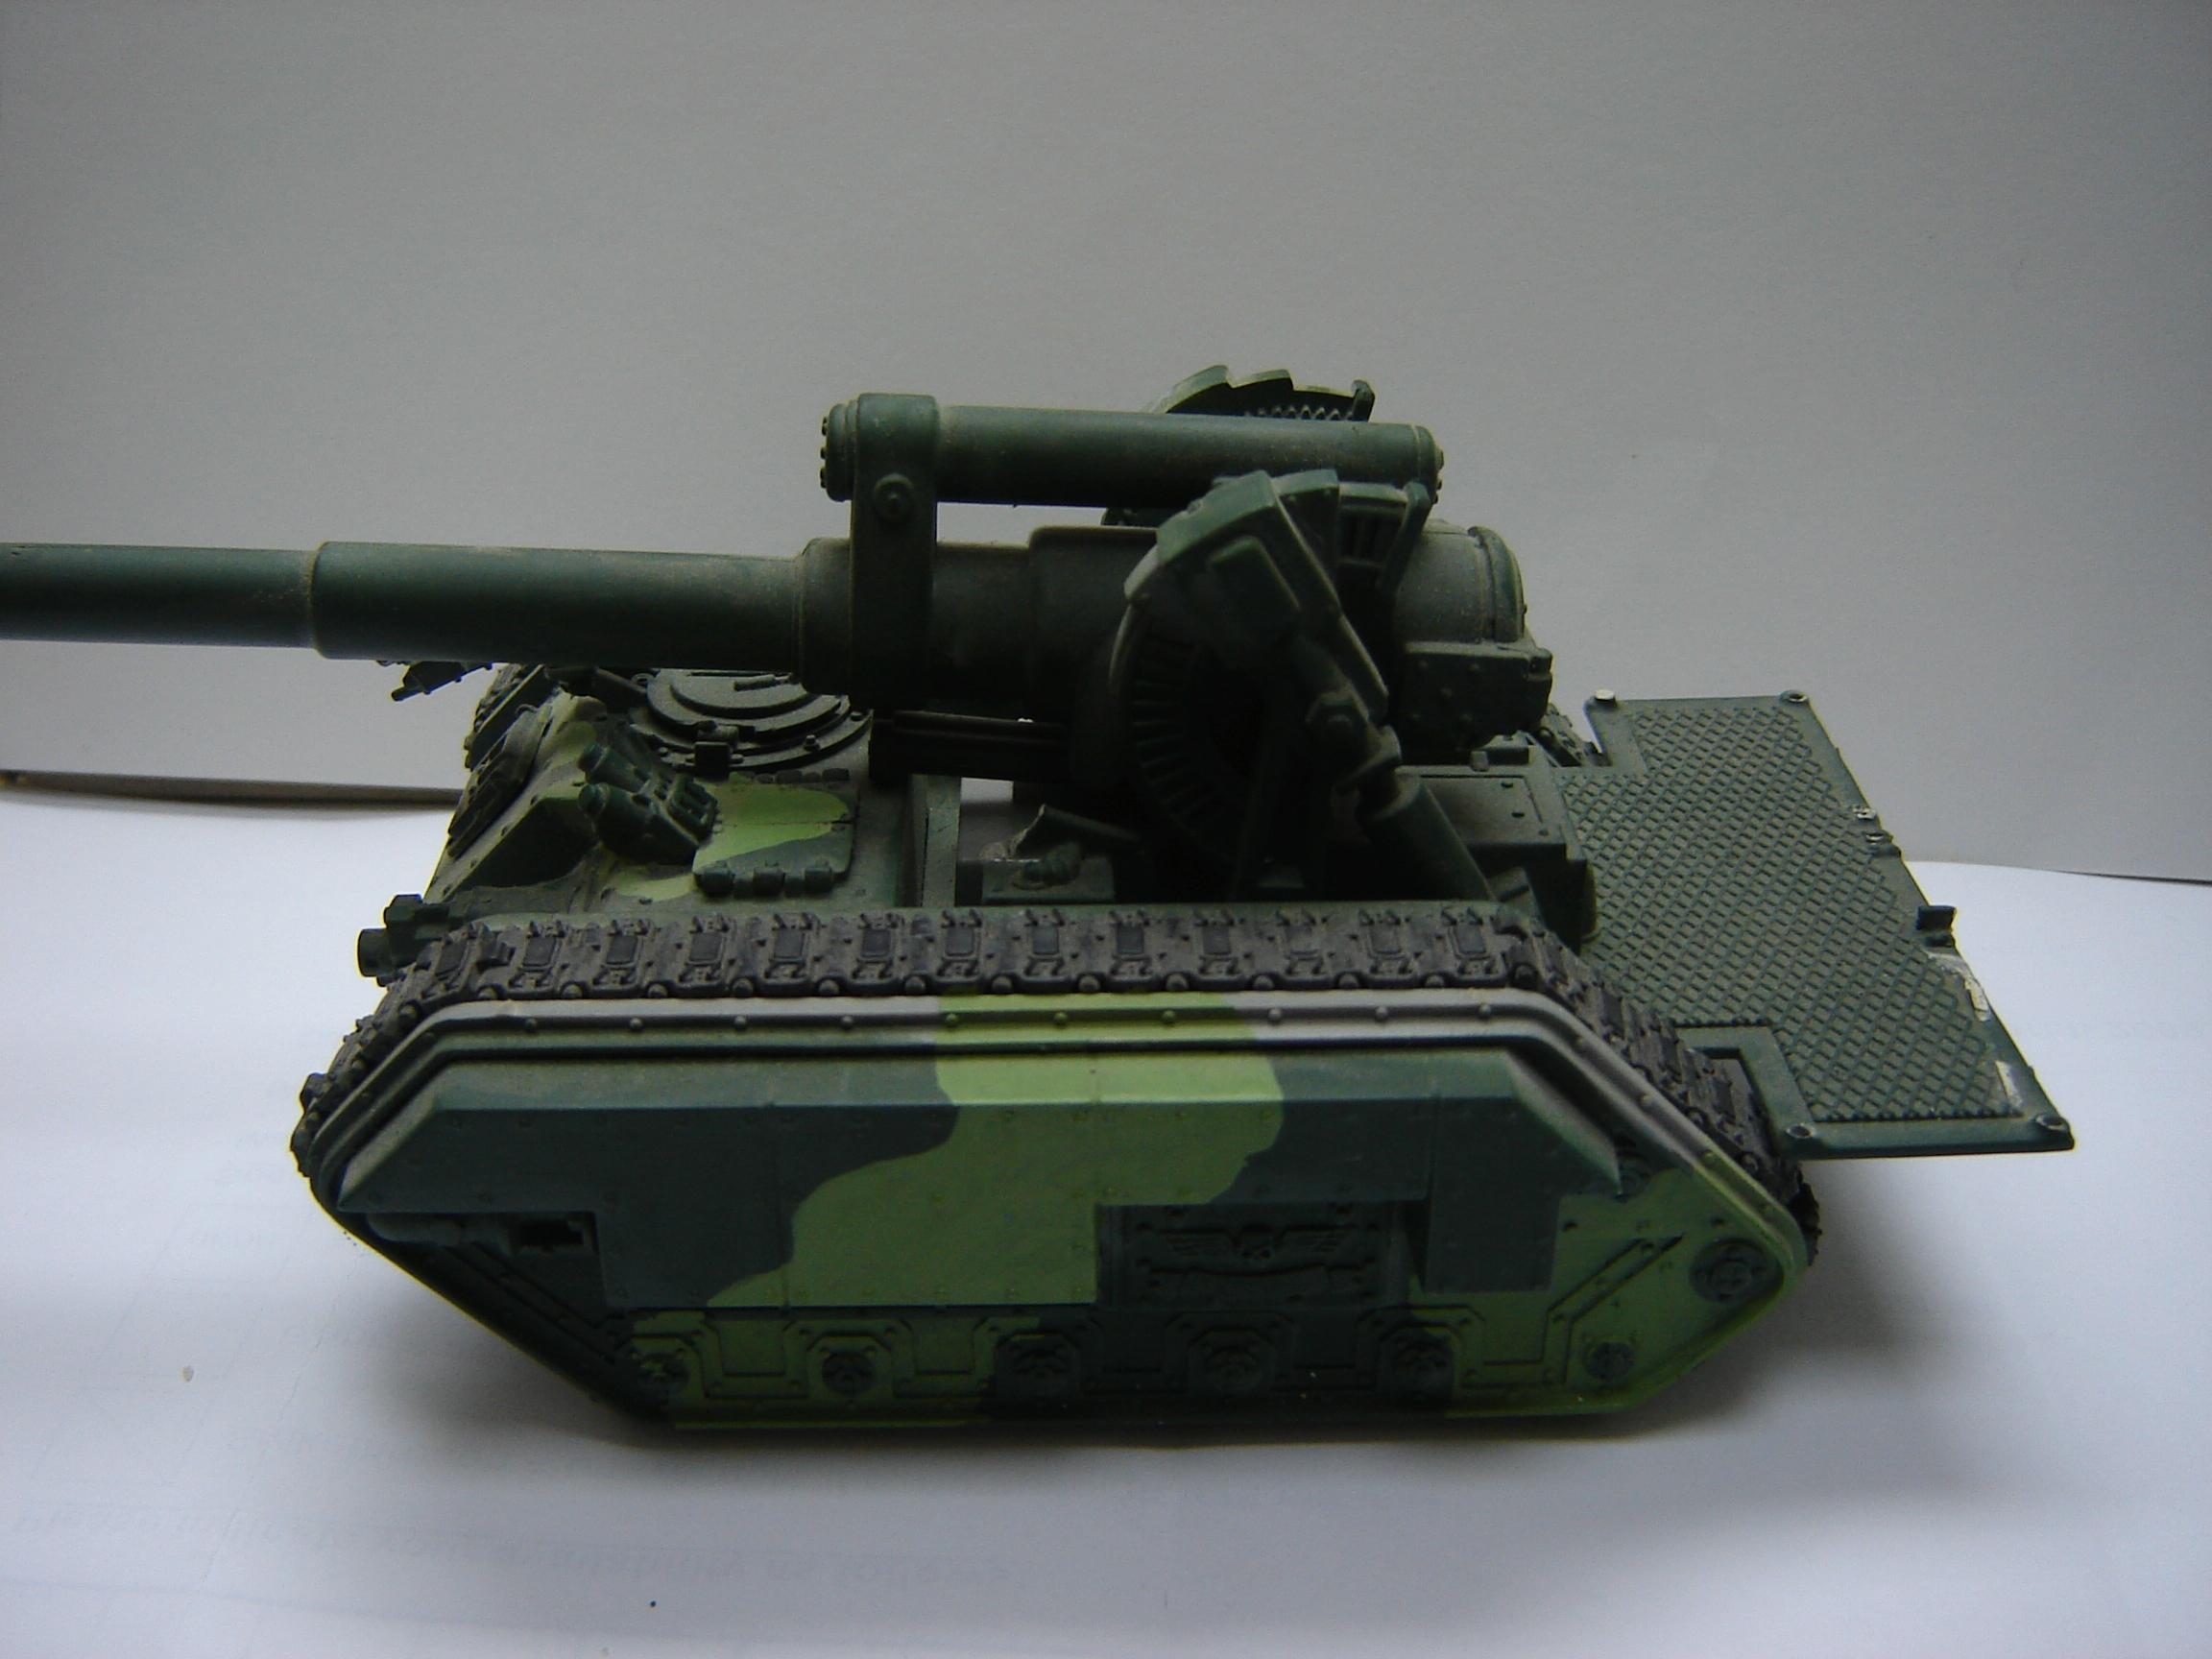 Armored Company, Basilisk, Imperial Guard, Urban Camo